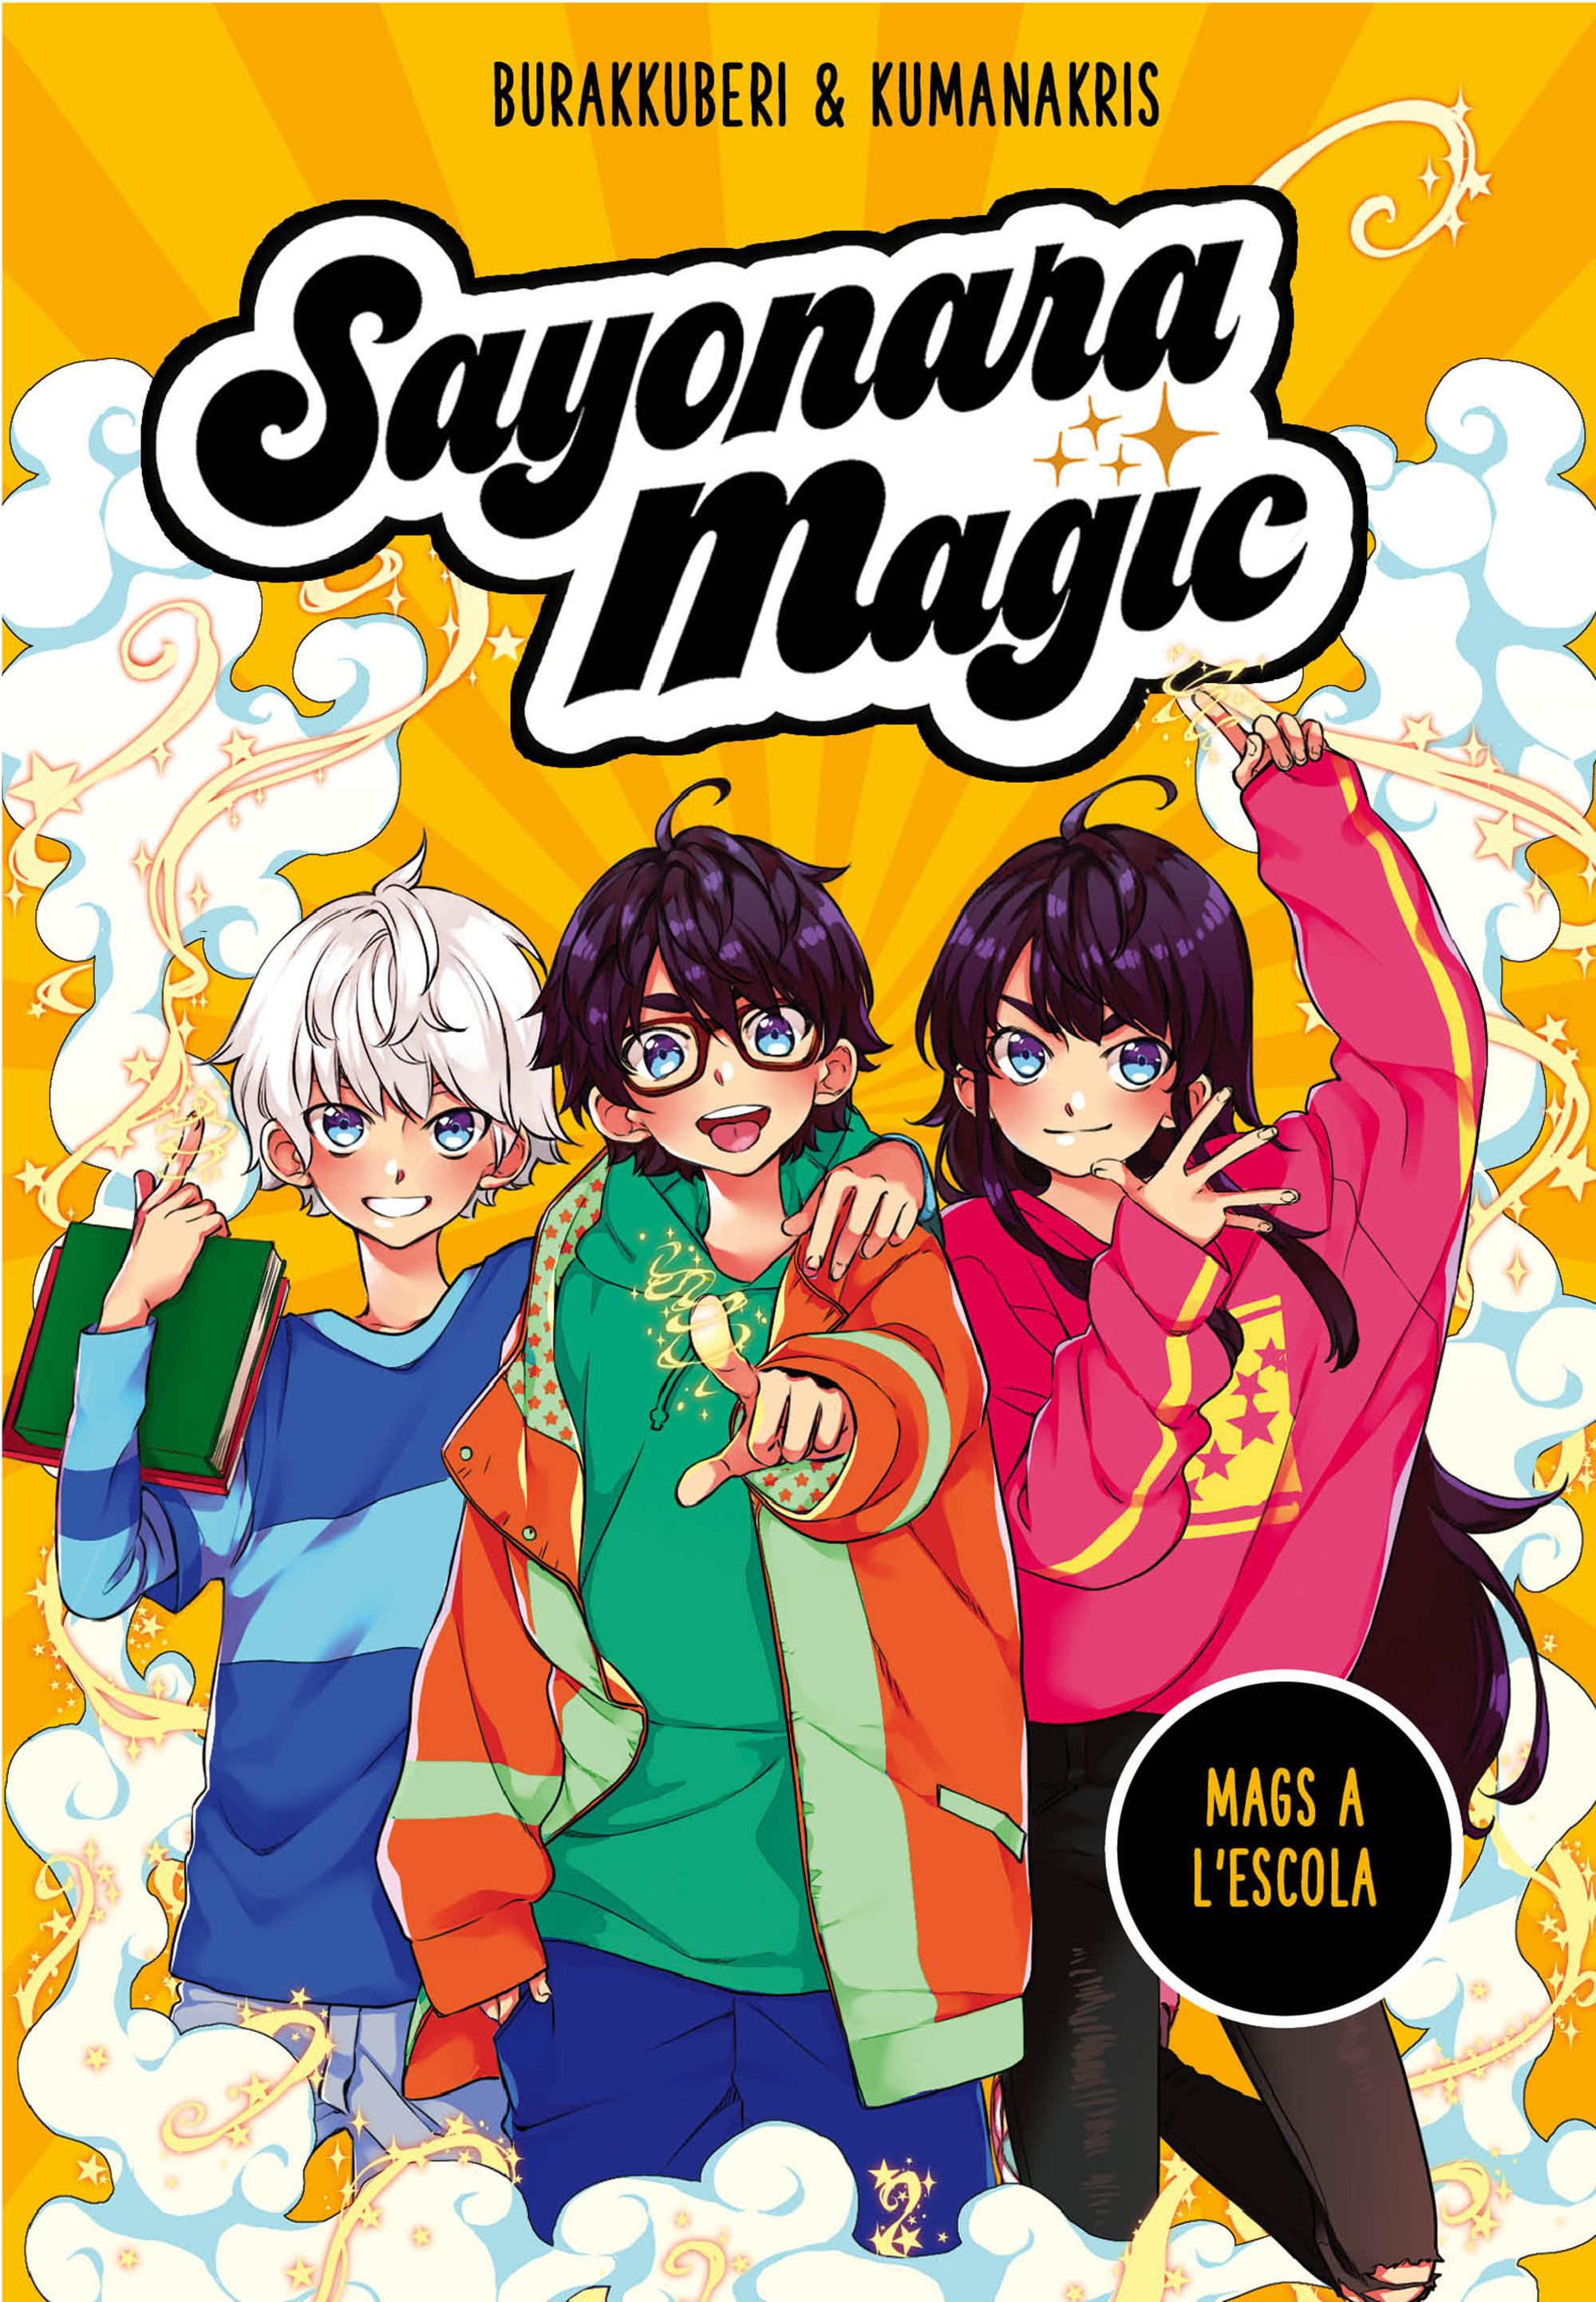 Sayonara Magic 1 Mags a l'escola (Sayonara Magic 1)